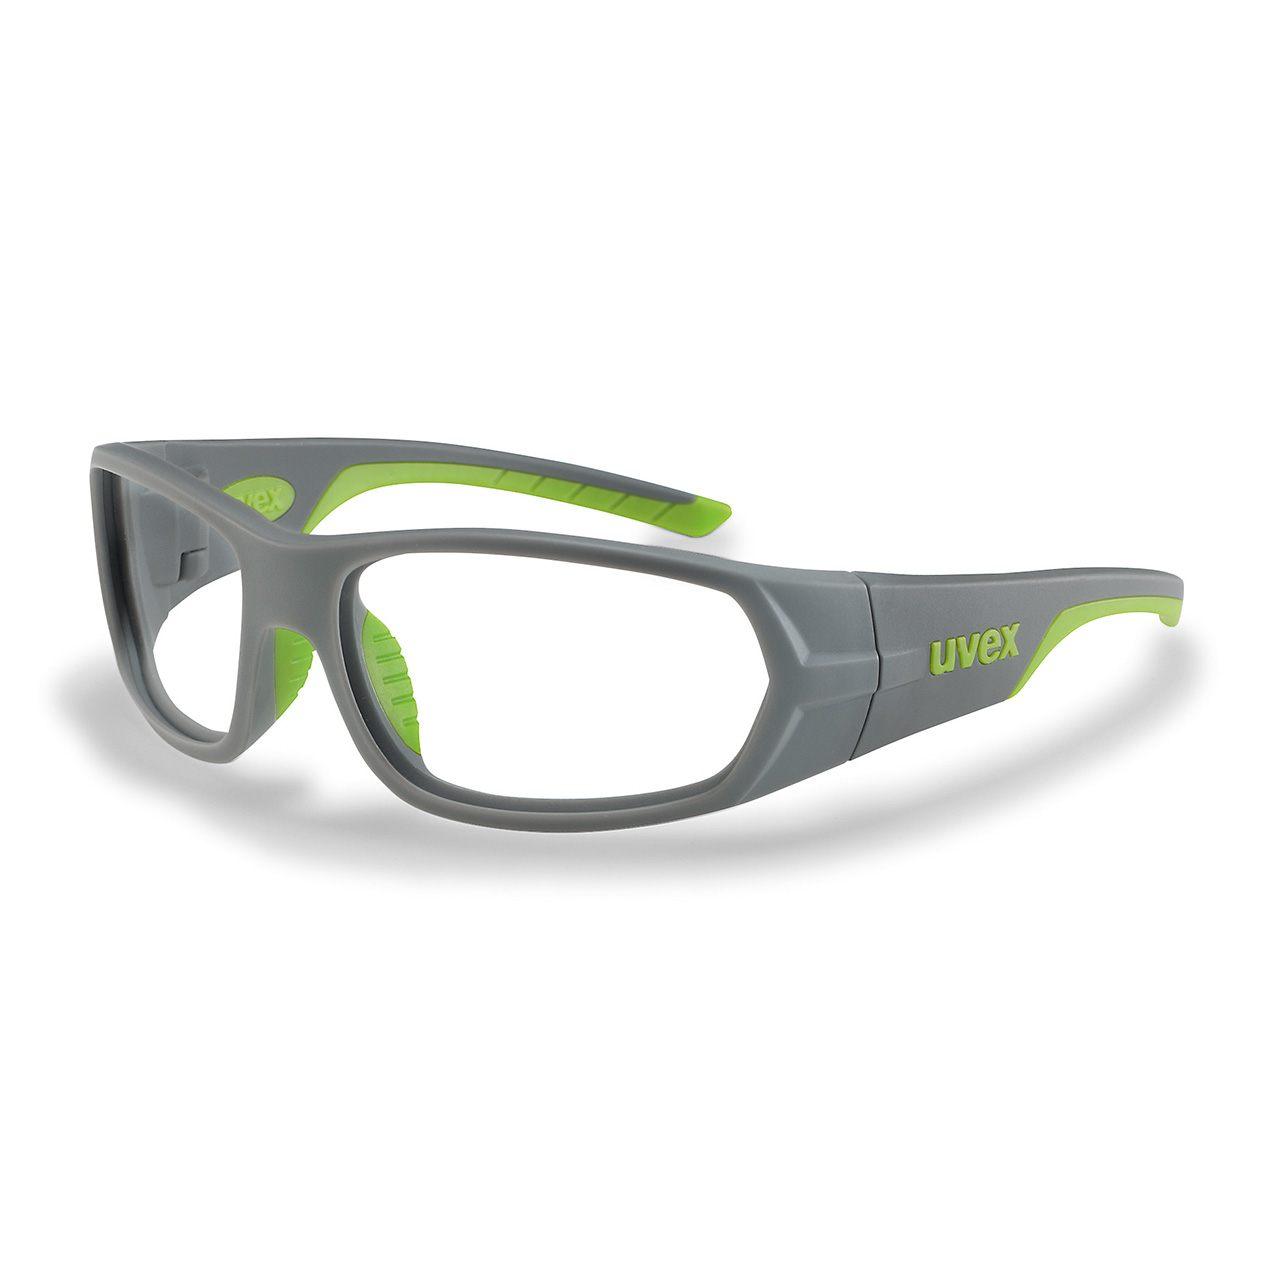 Uvex Rx Sp 5513 Prescription Safety Spectacles Prescription Safety Eyewear Individual Ppe Uvex Safety